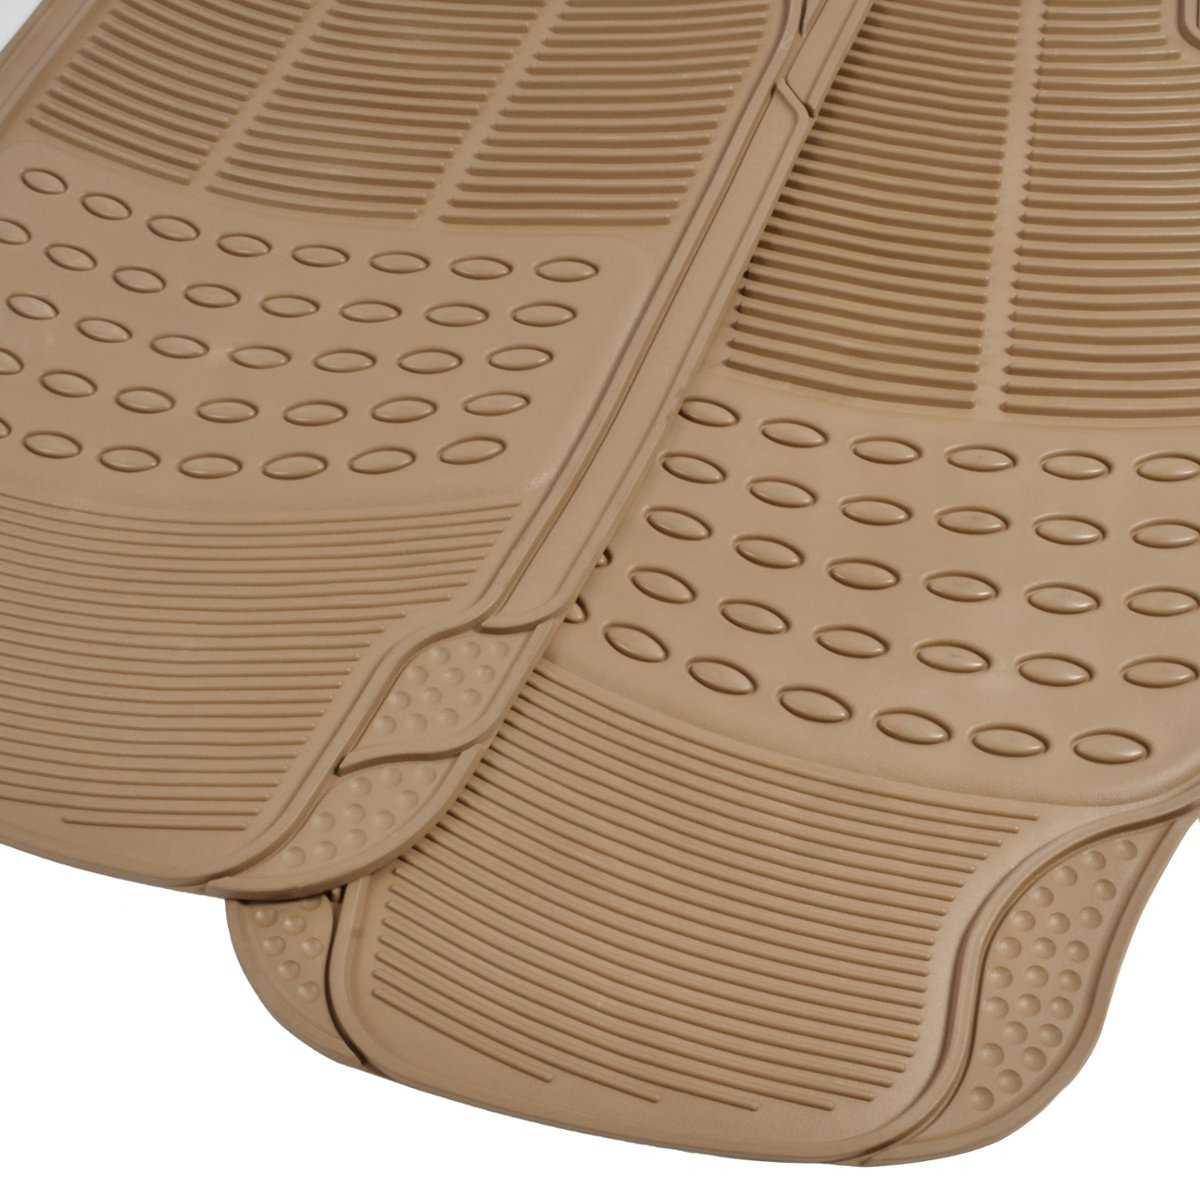 BDK Front and Back ProLiner Heavy Duty Rubber Floor Mats for Auto Tan Beige 3 Piece Set